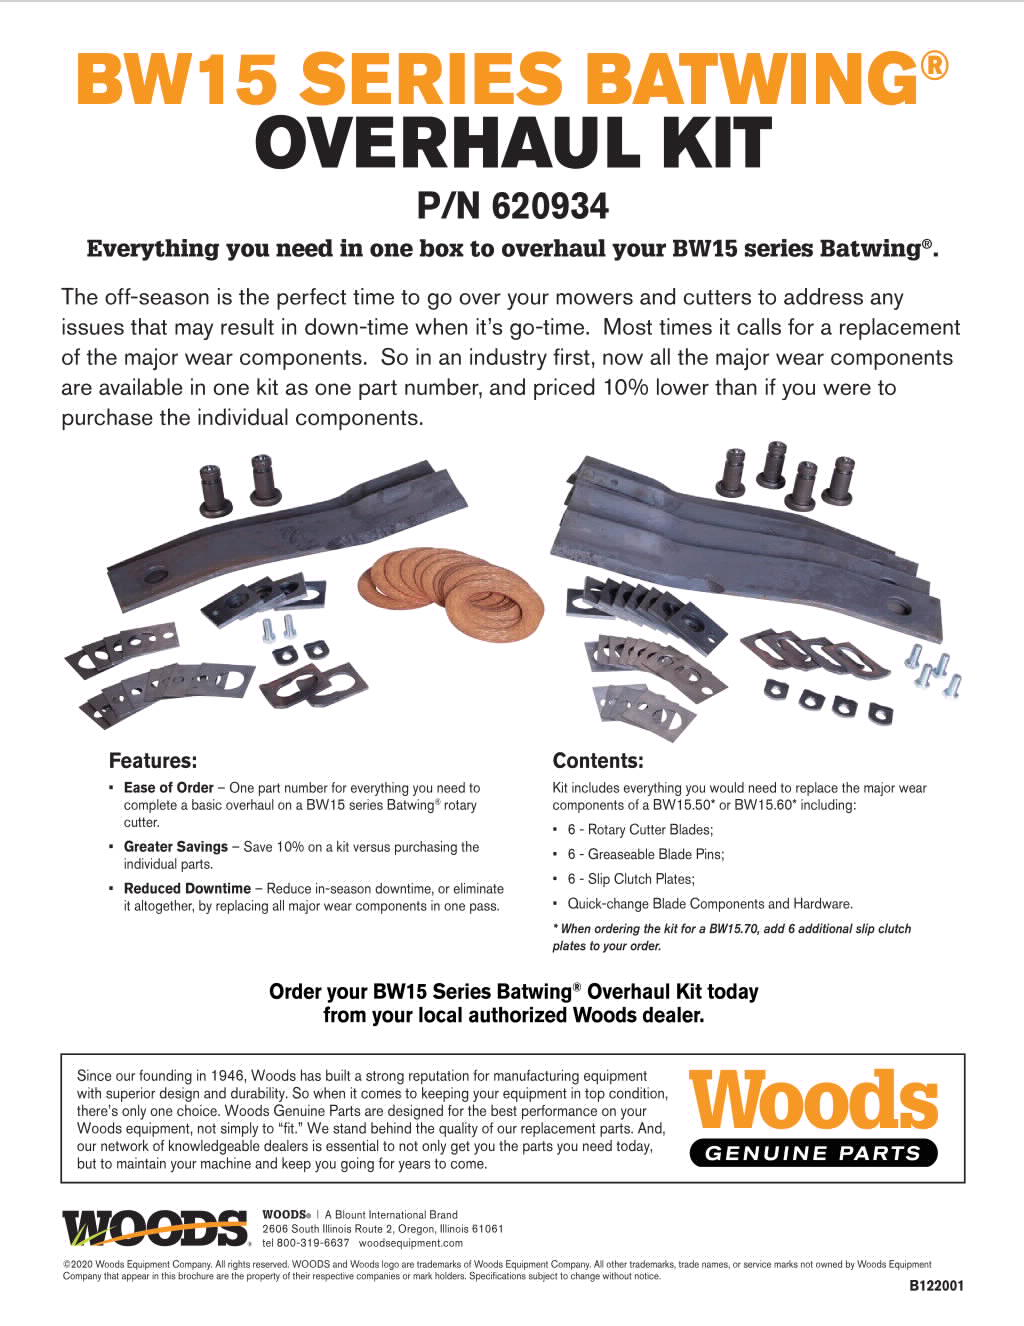 BW15 Series Overhaul Kit